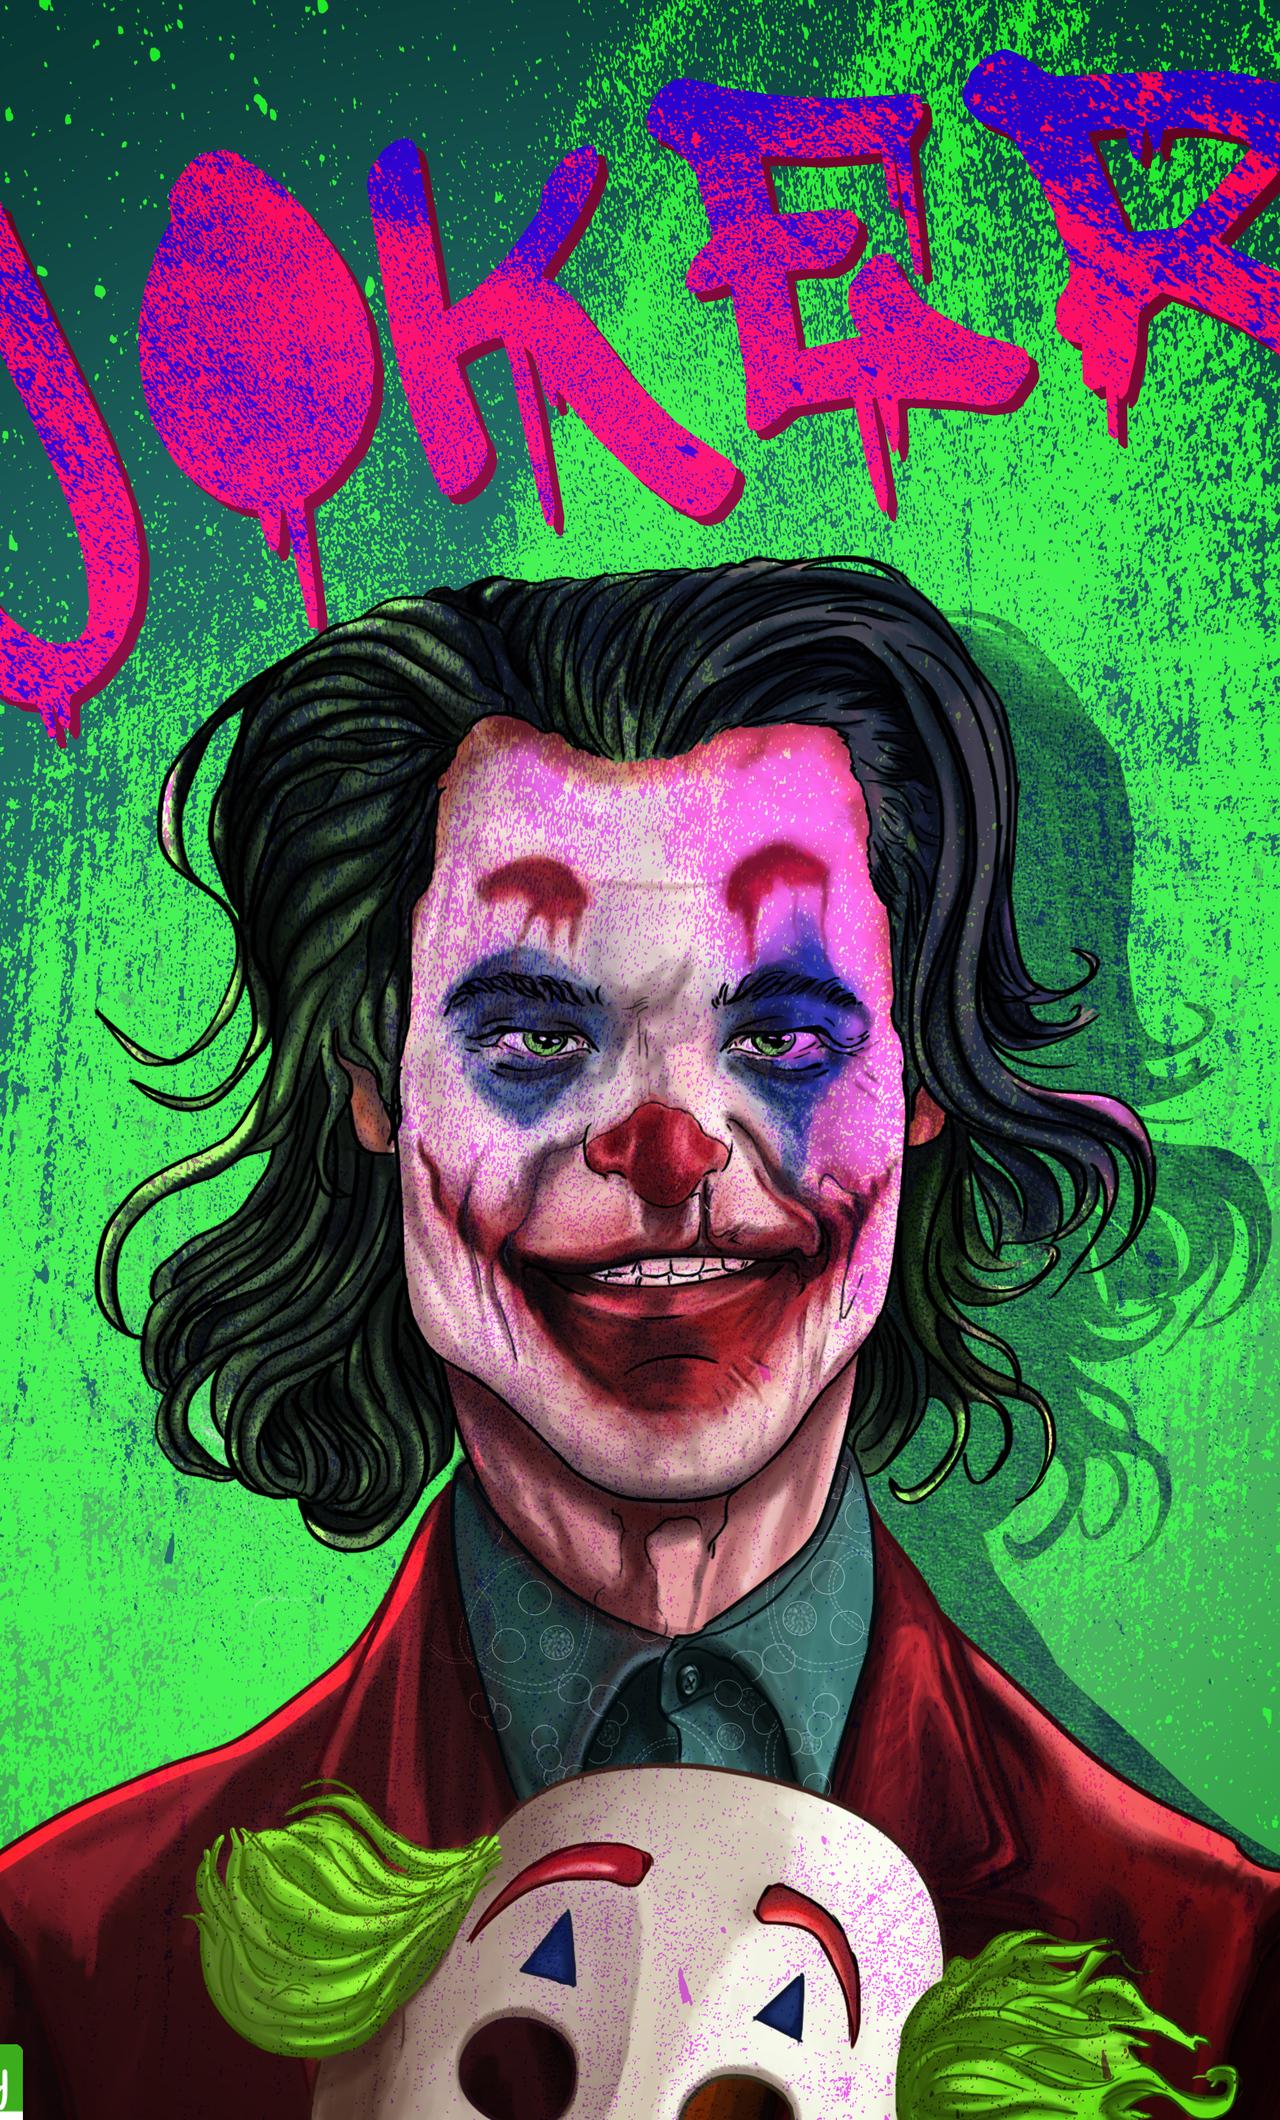 1280x2120 The Joker Joaquin Phoenix Artwork Iphone 6 Hd 4k